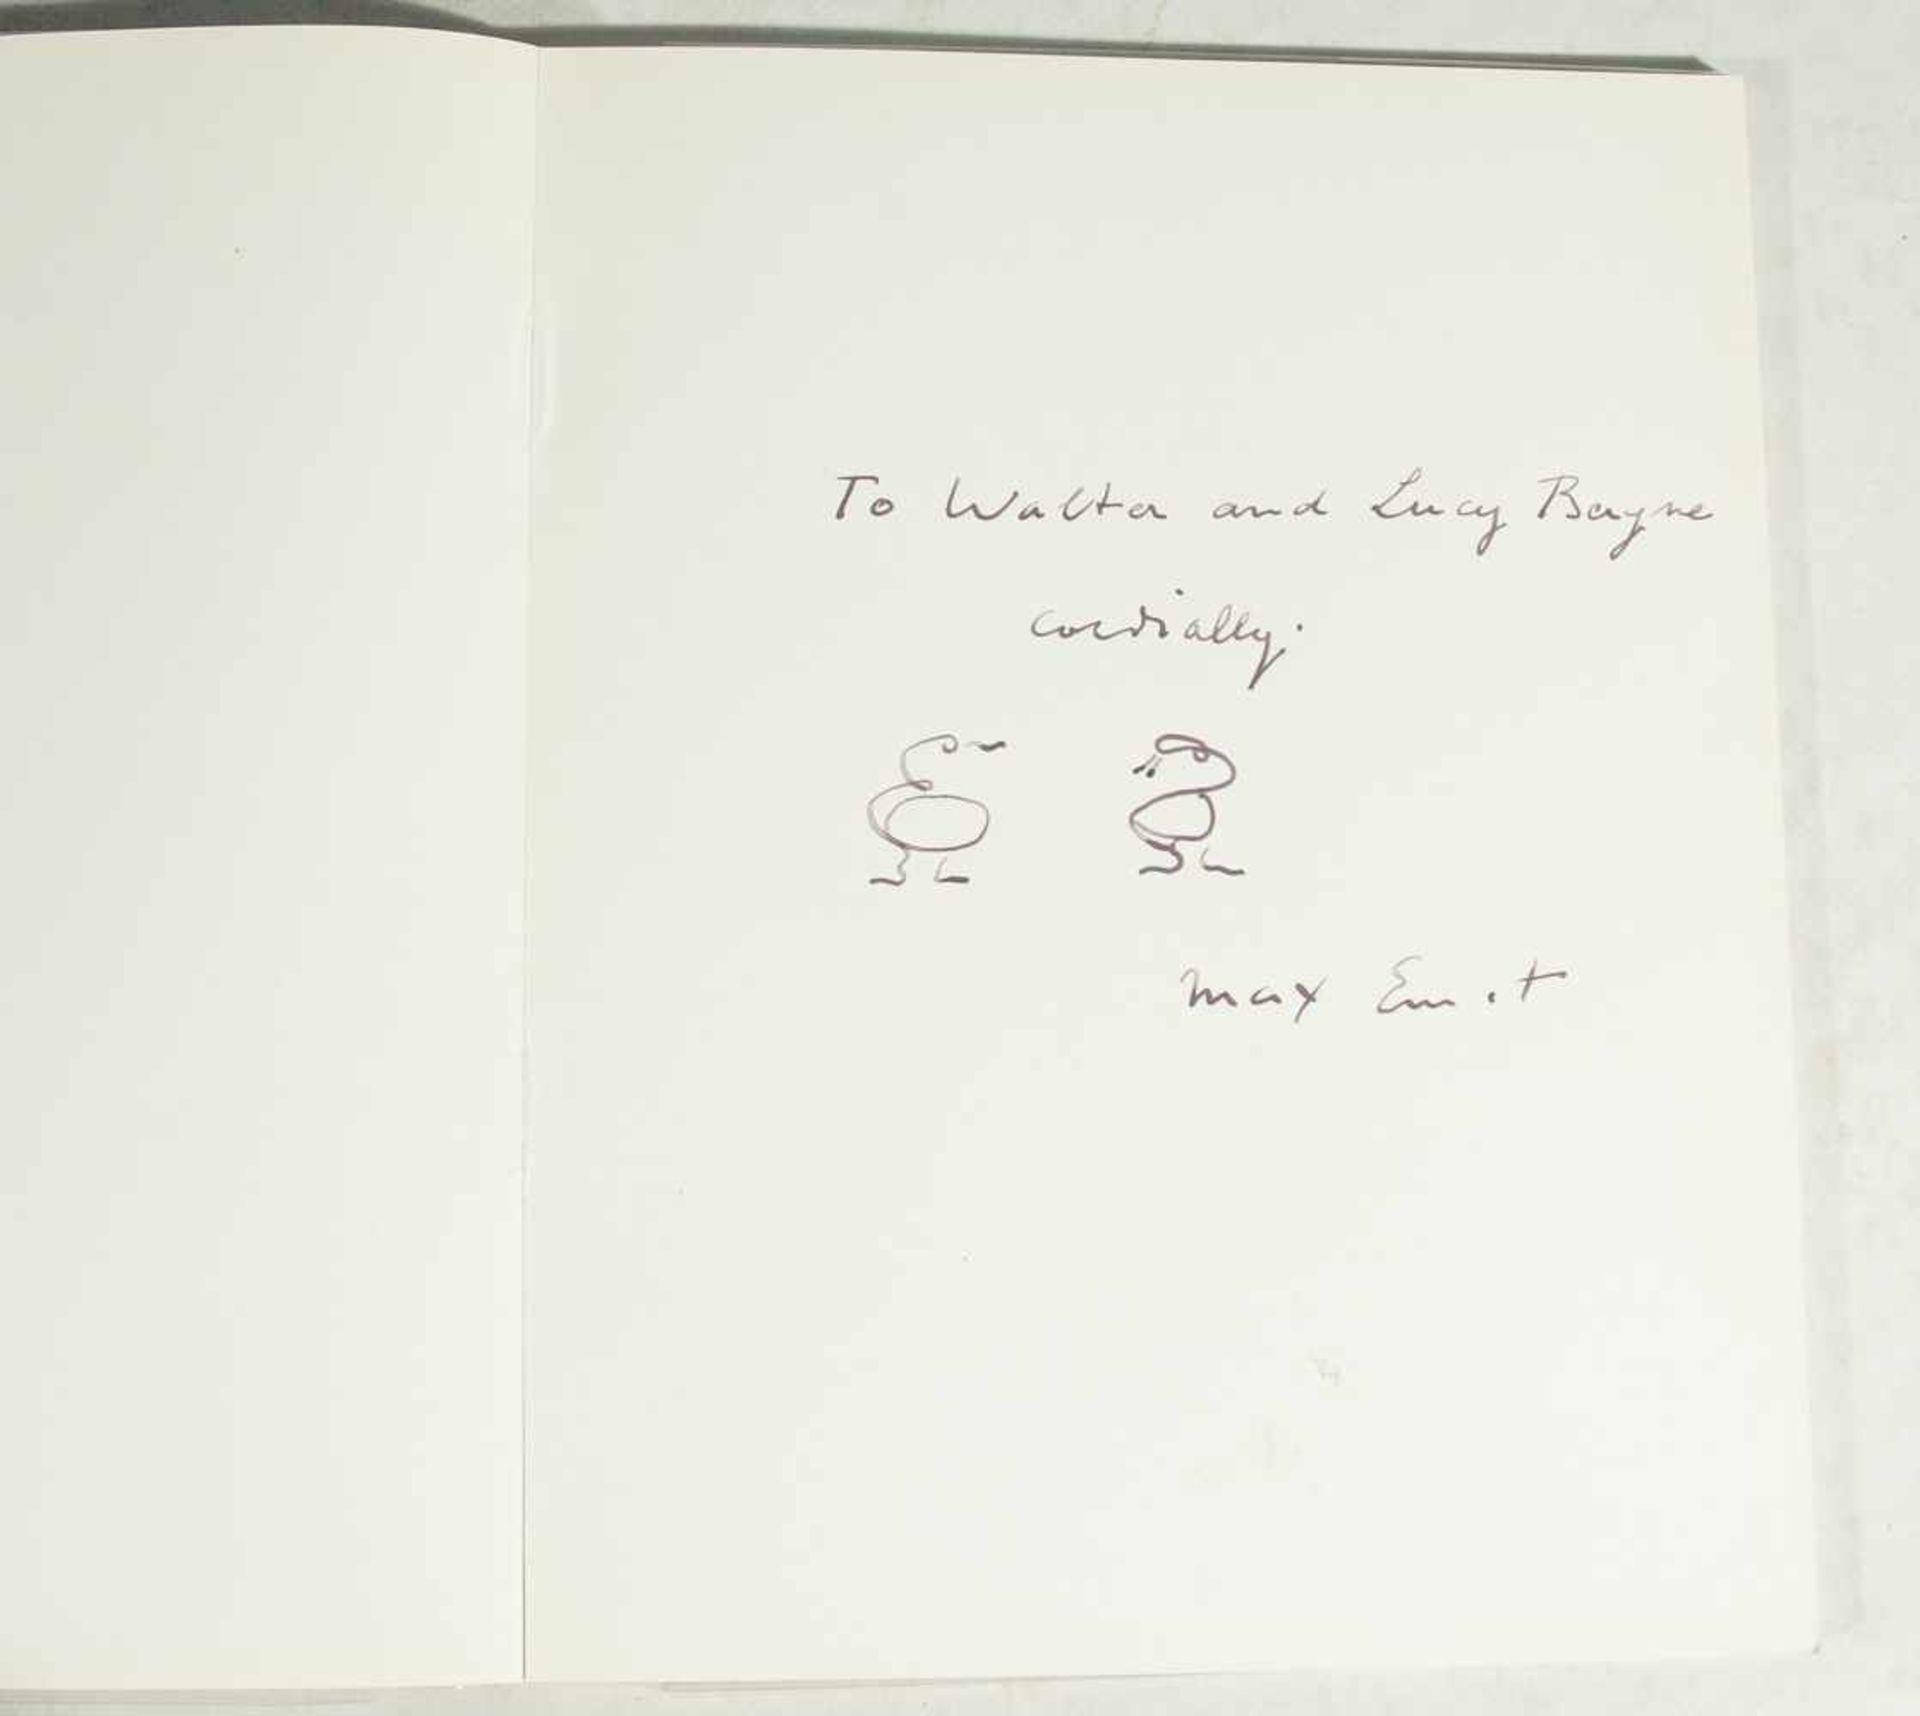 Los 10 - Max Ernst (Brühl, Germany, 1891 - Paris, 1976)